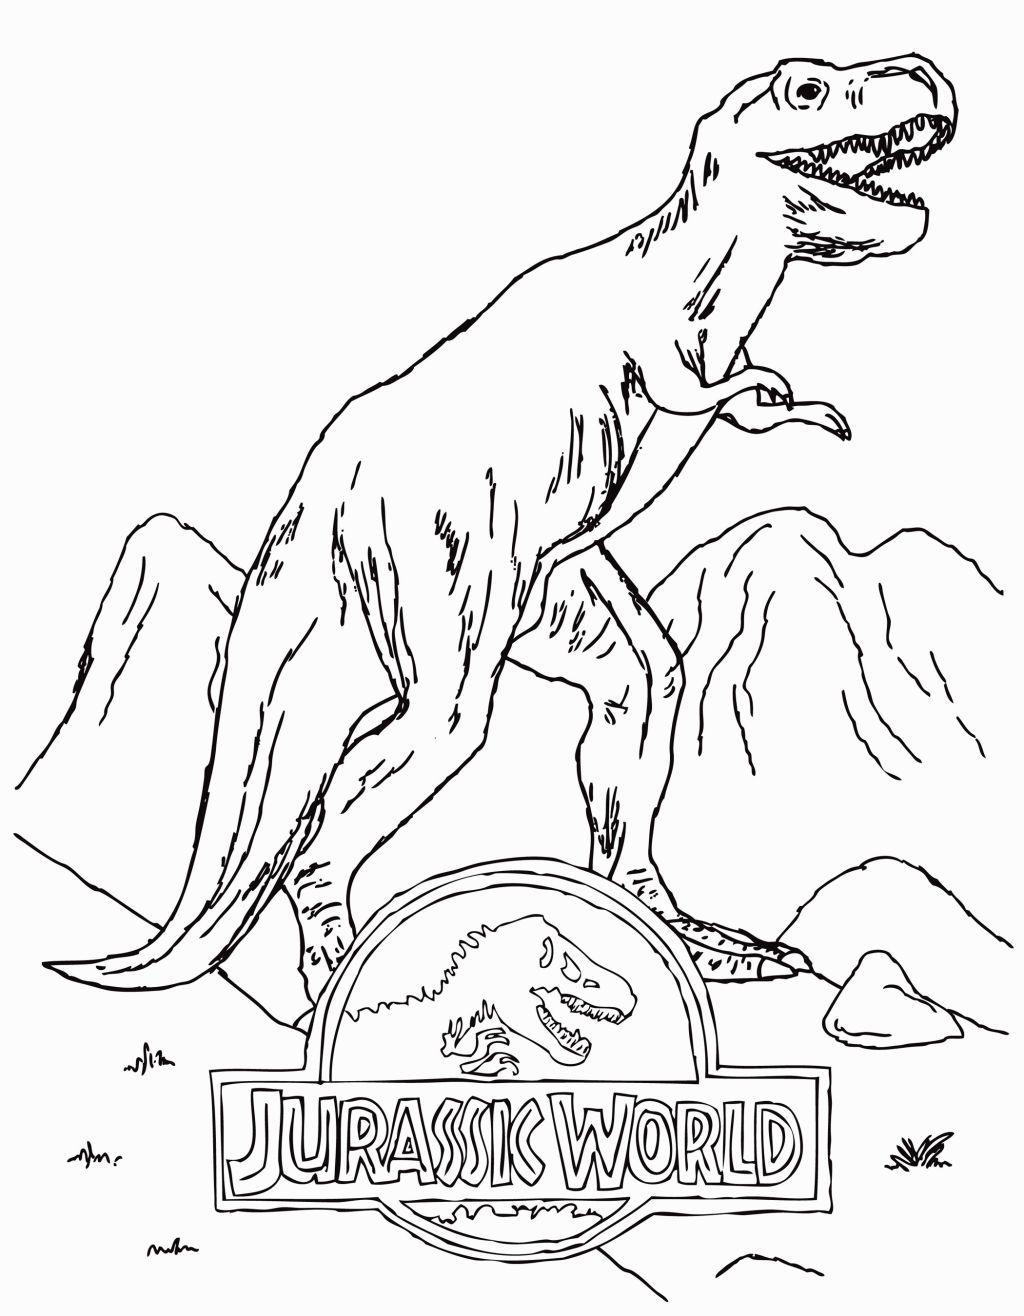 Jurassic World Coloring Sheets Dibujos Para Colorear Dibujos